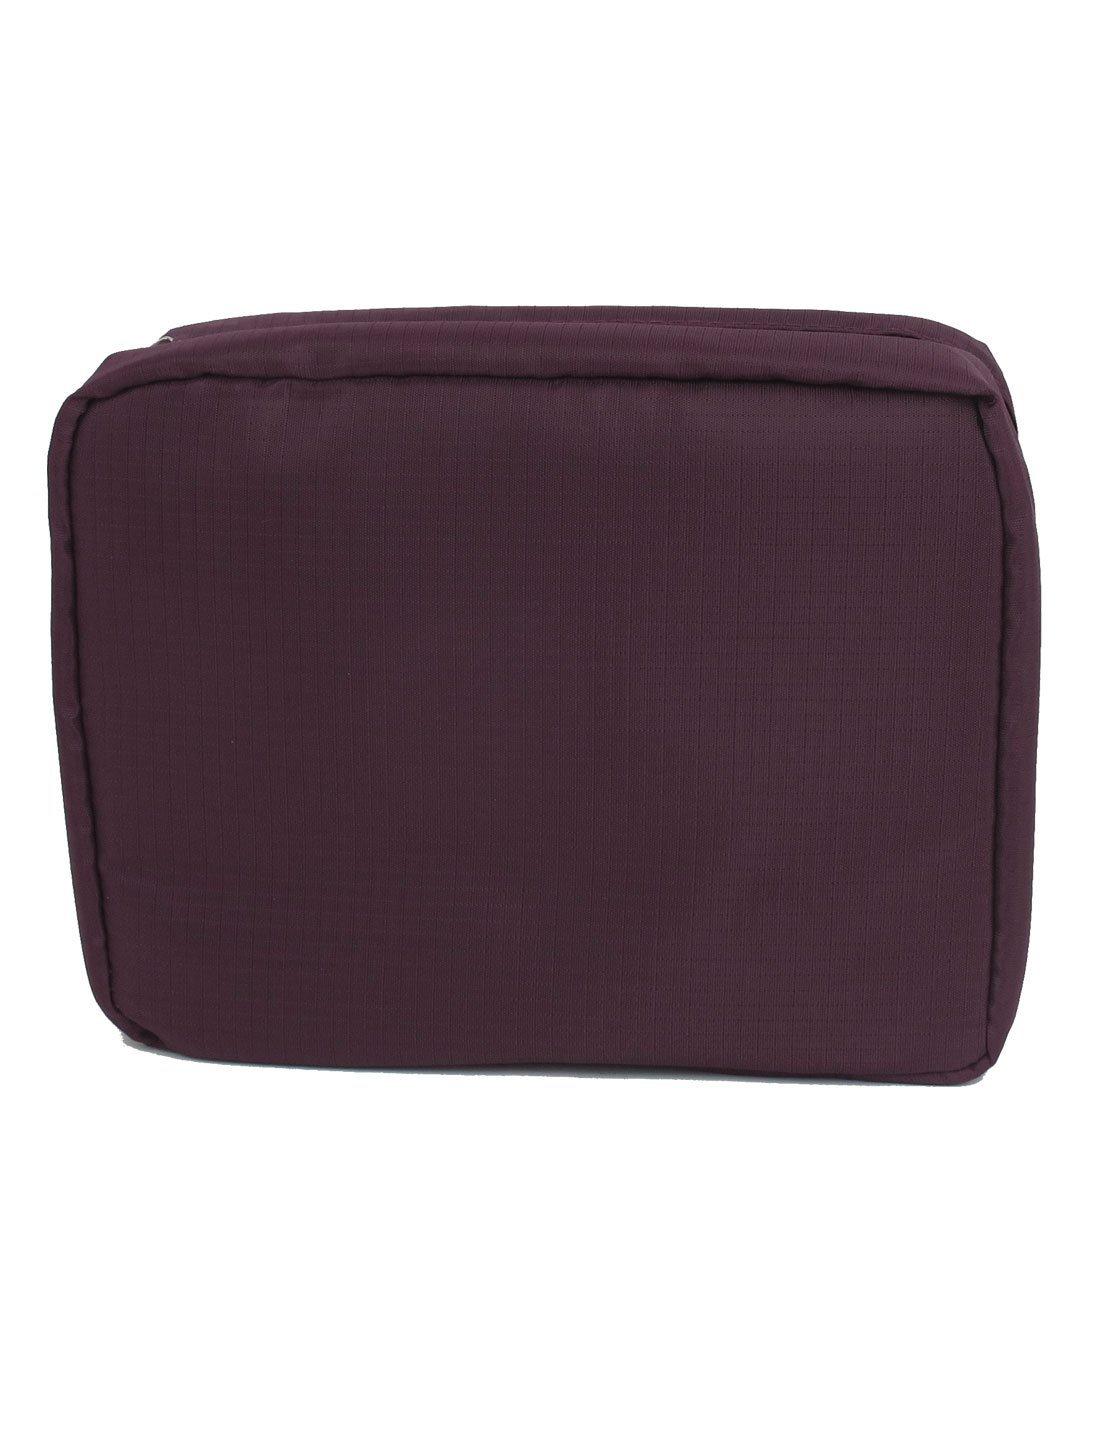 Amazon.com: Viajes eDealMax Higiene Artículos de higiene cosmética de afeitar de Lavado Bolsa de almacenamiento caja de la caja de Borgoña: Health ...